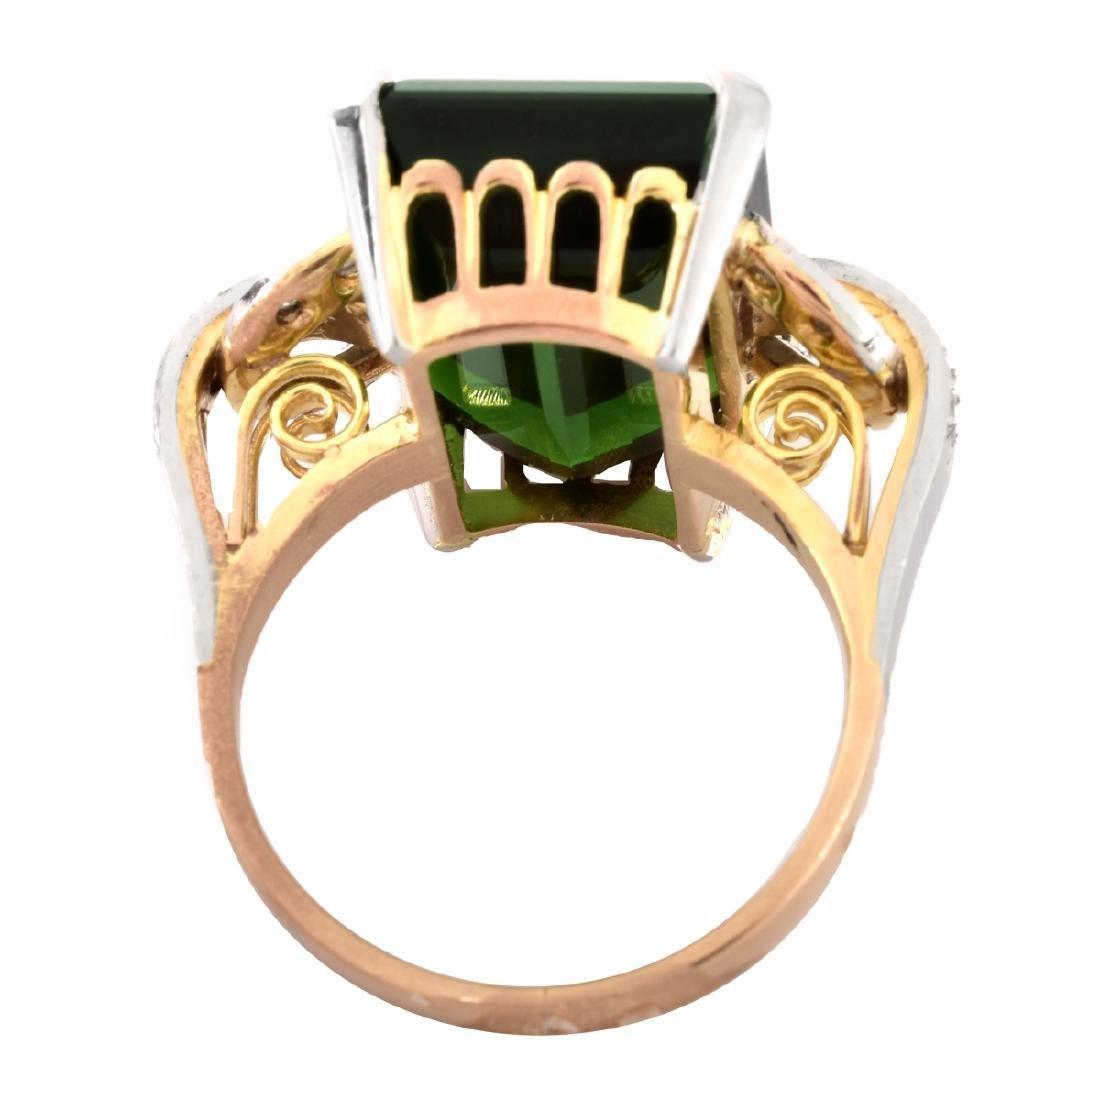 French Tourmaline, Diamond and 18K Gold Ring - 4